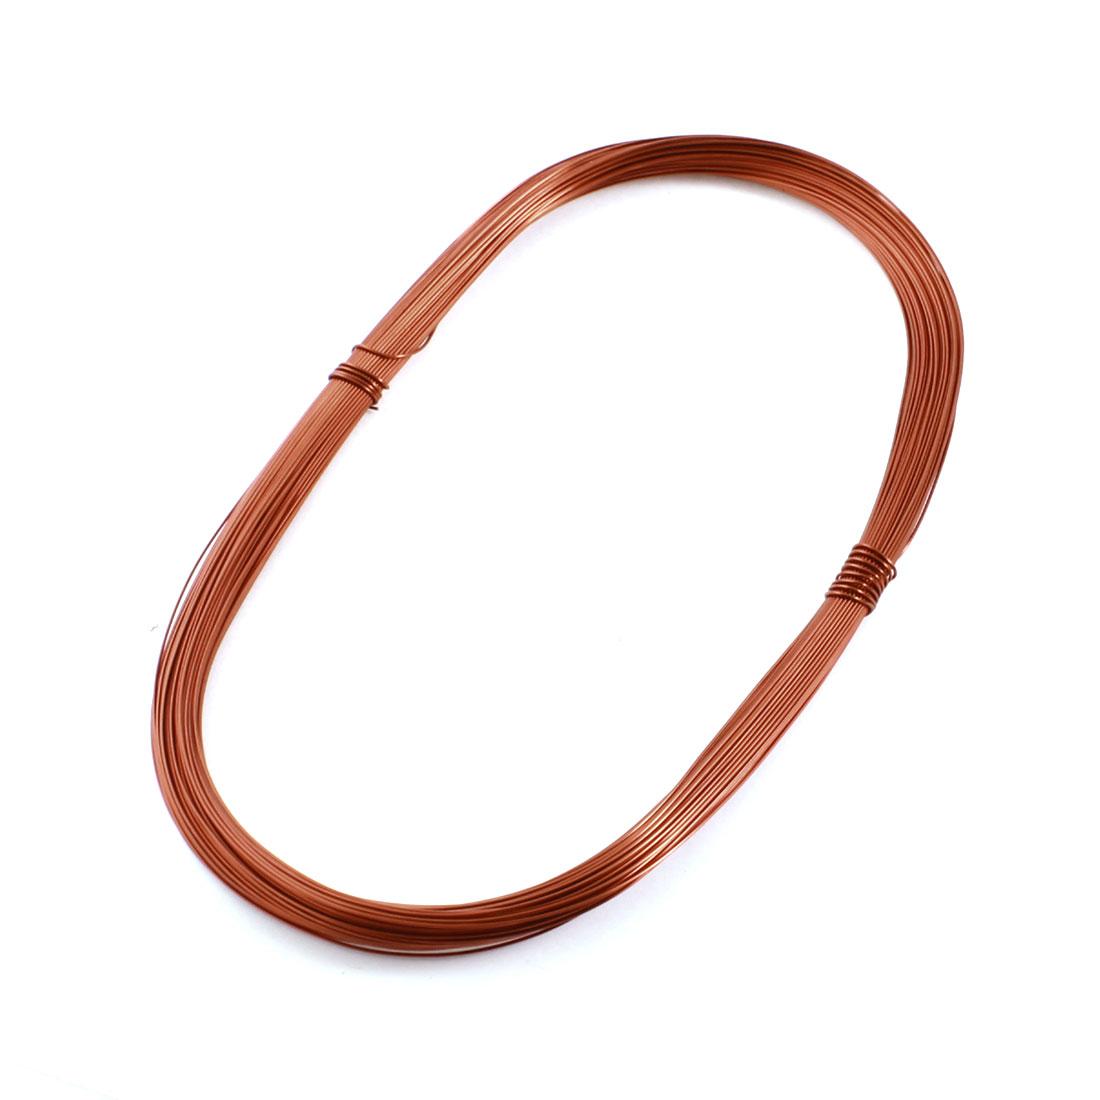 0.64mm Diameter Copper Solder Soldering Enamelled Winding Wire 50m 164ft Length